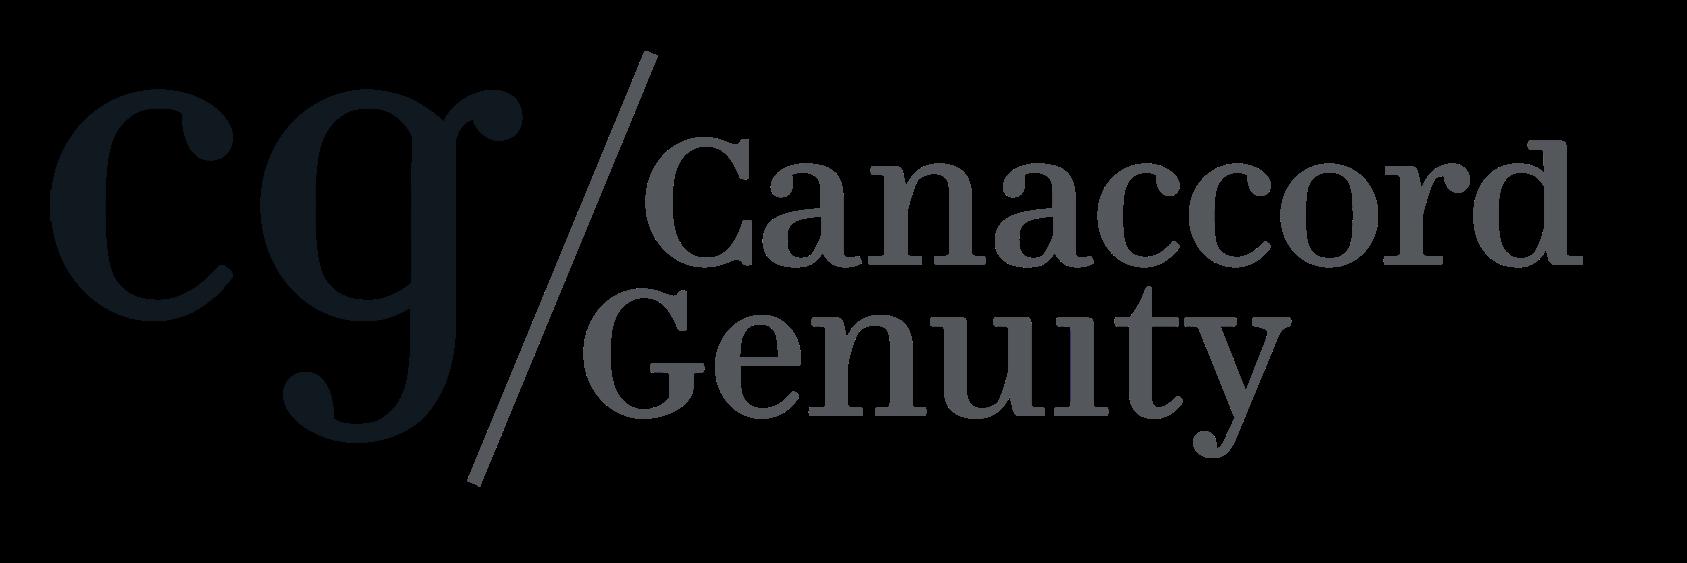 Canaccord Genuity logo